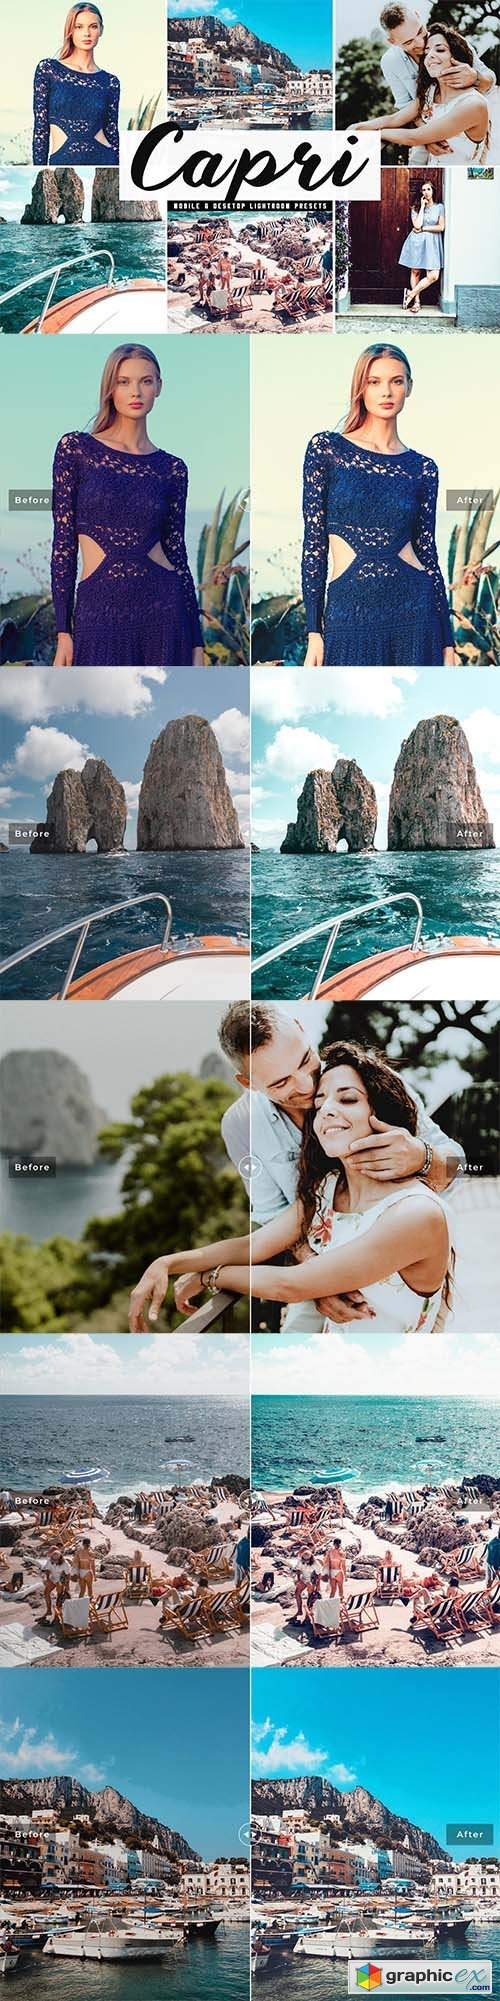 Capri Mobile & Desktop Lightroom Presets